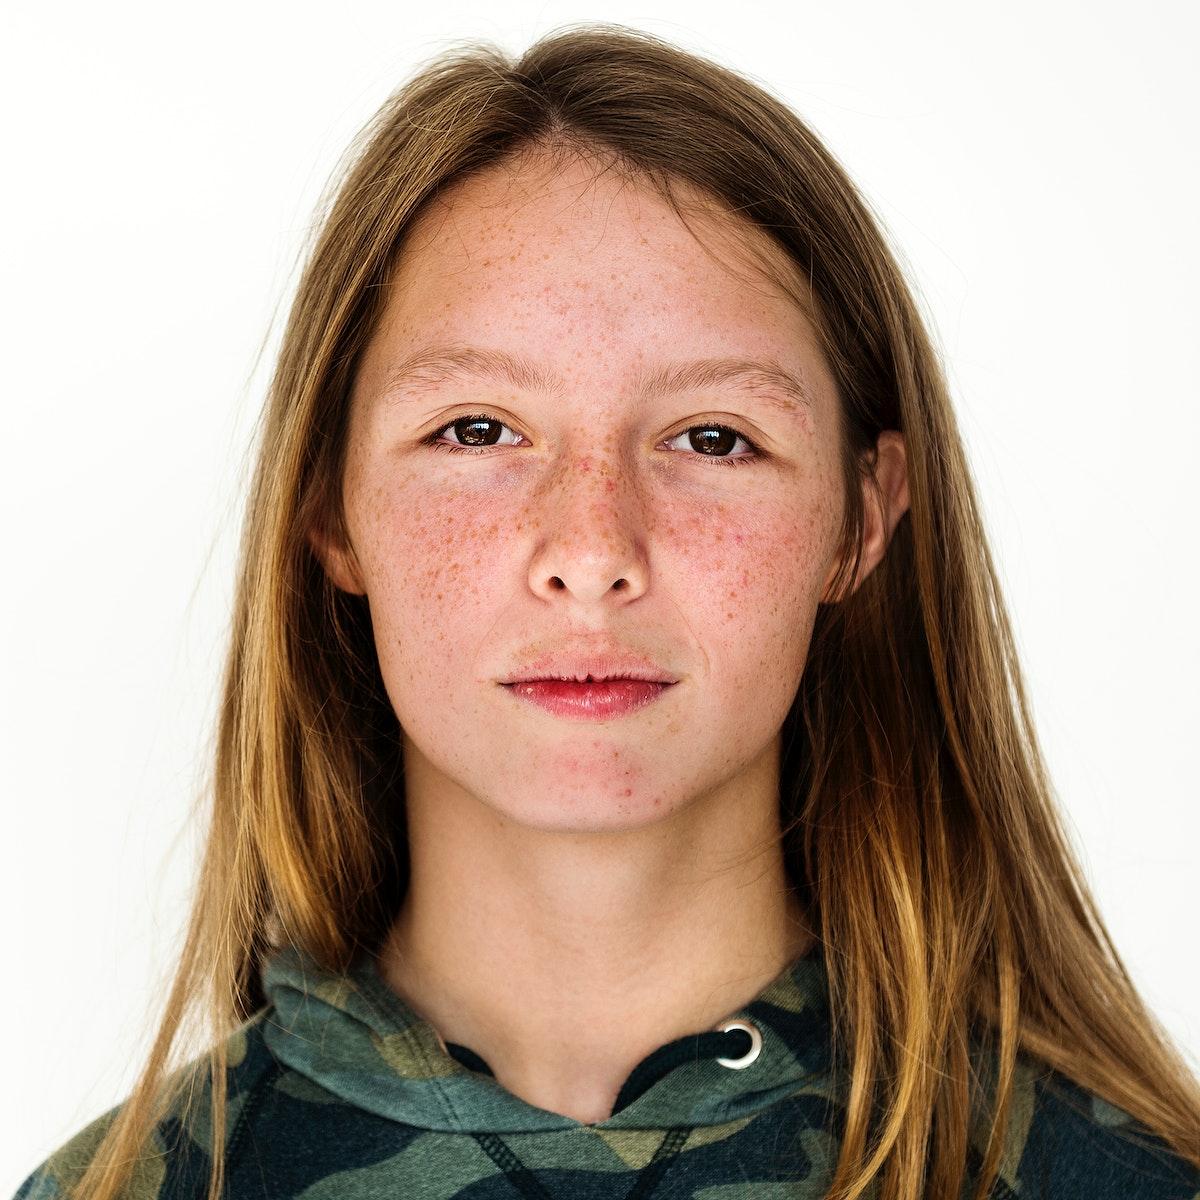 Worldface-Australian girl in a white background